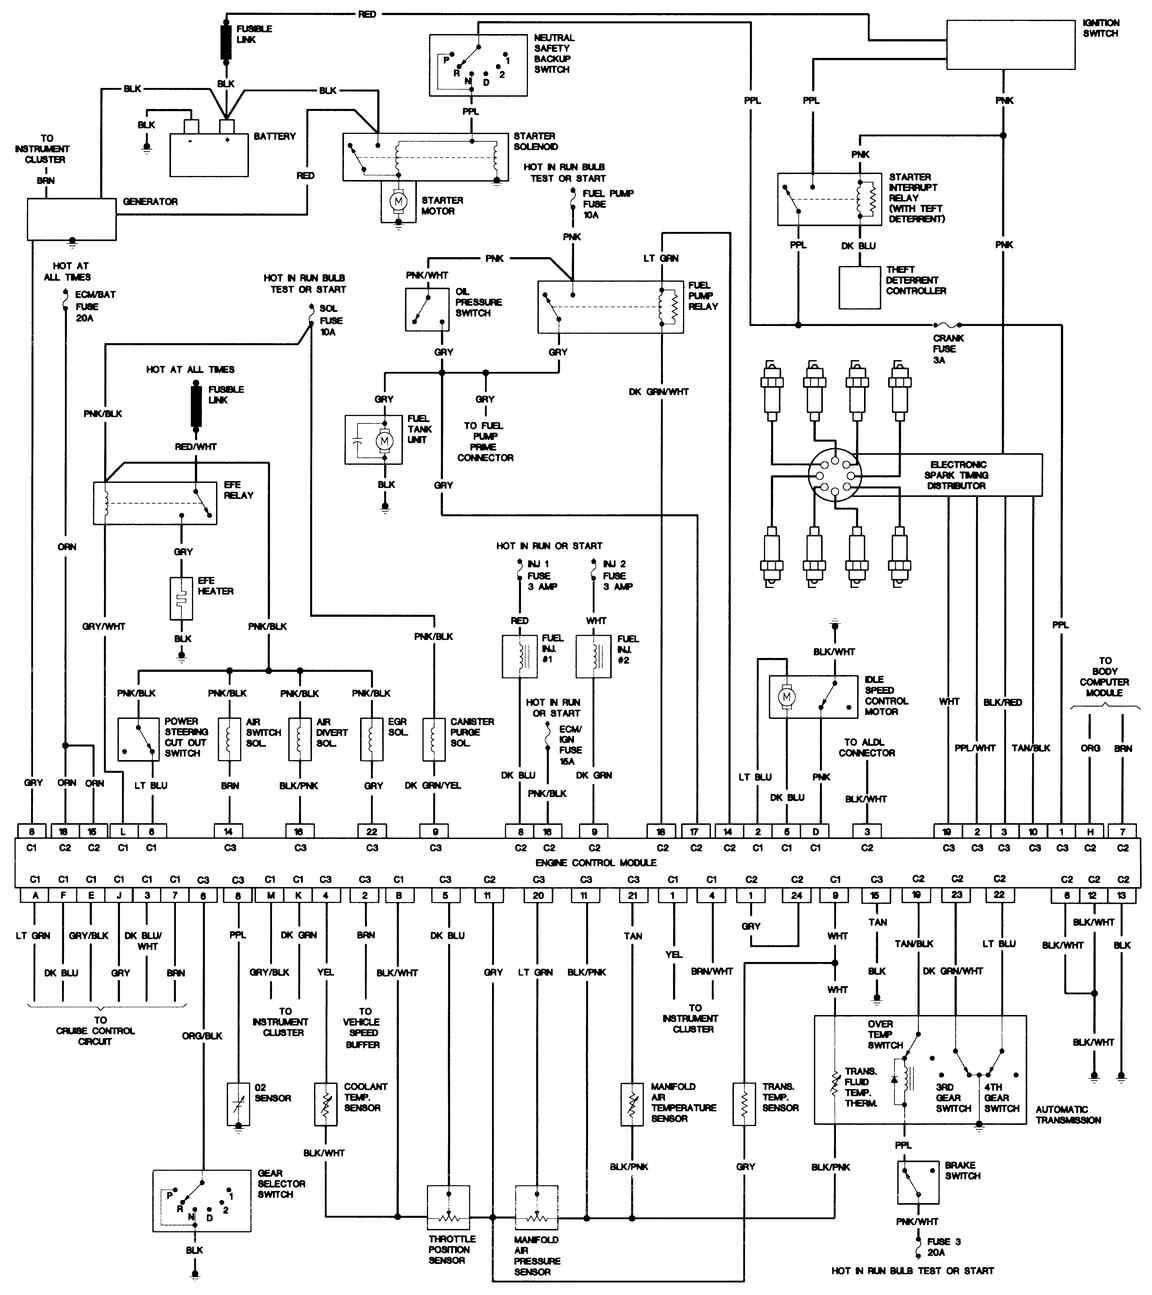 1991 Bounder Wiring Diagram Data Jayco Diagrams Free Online Fleetwood Motorhome